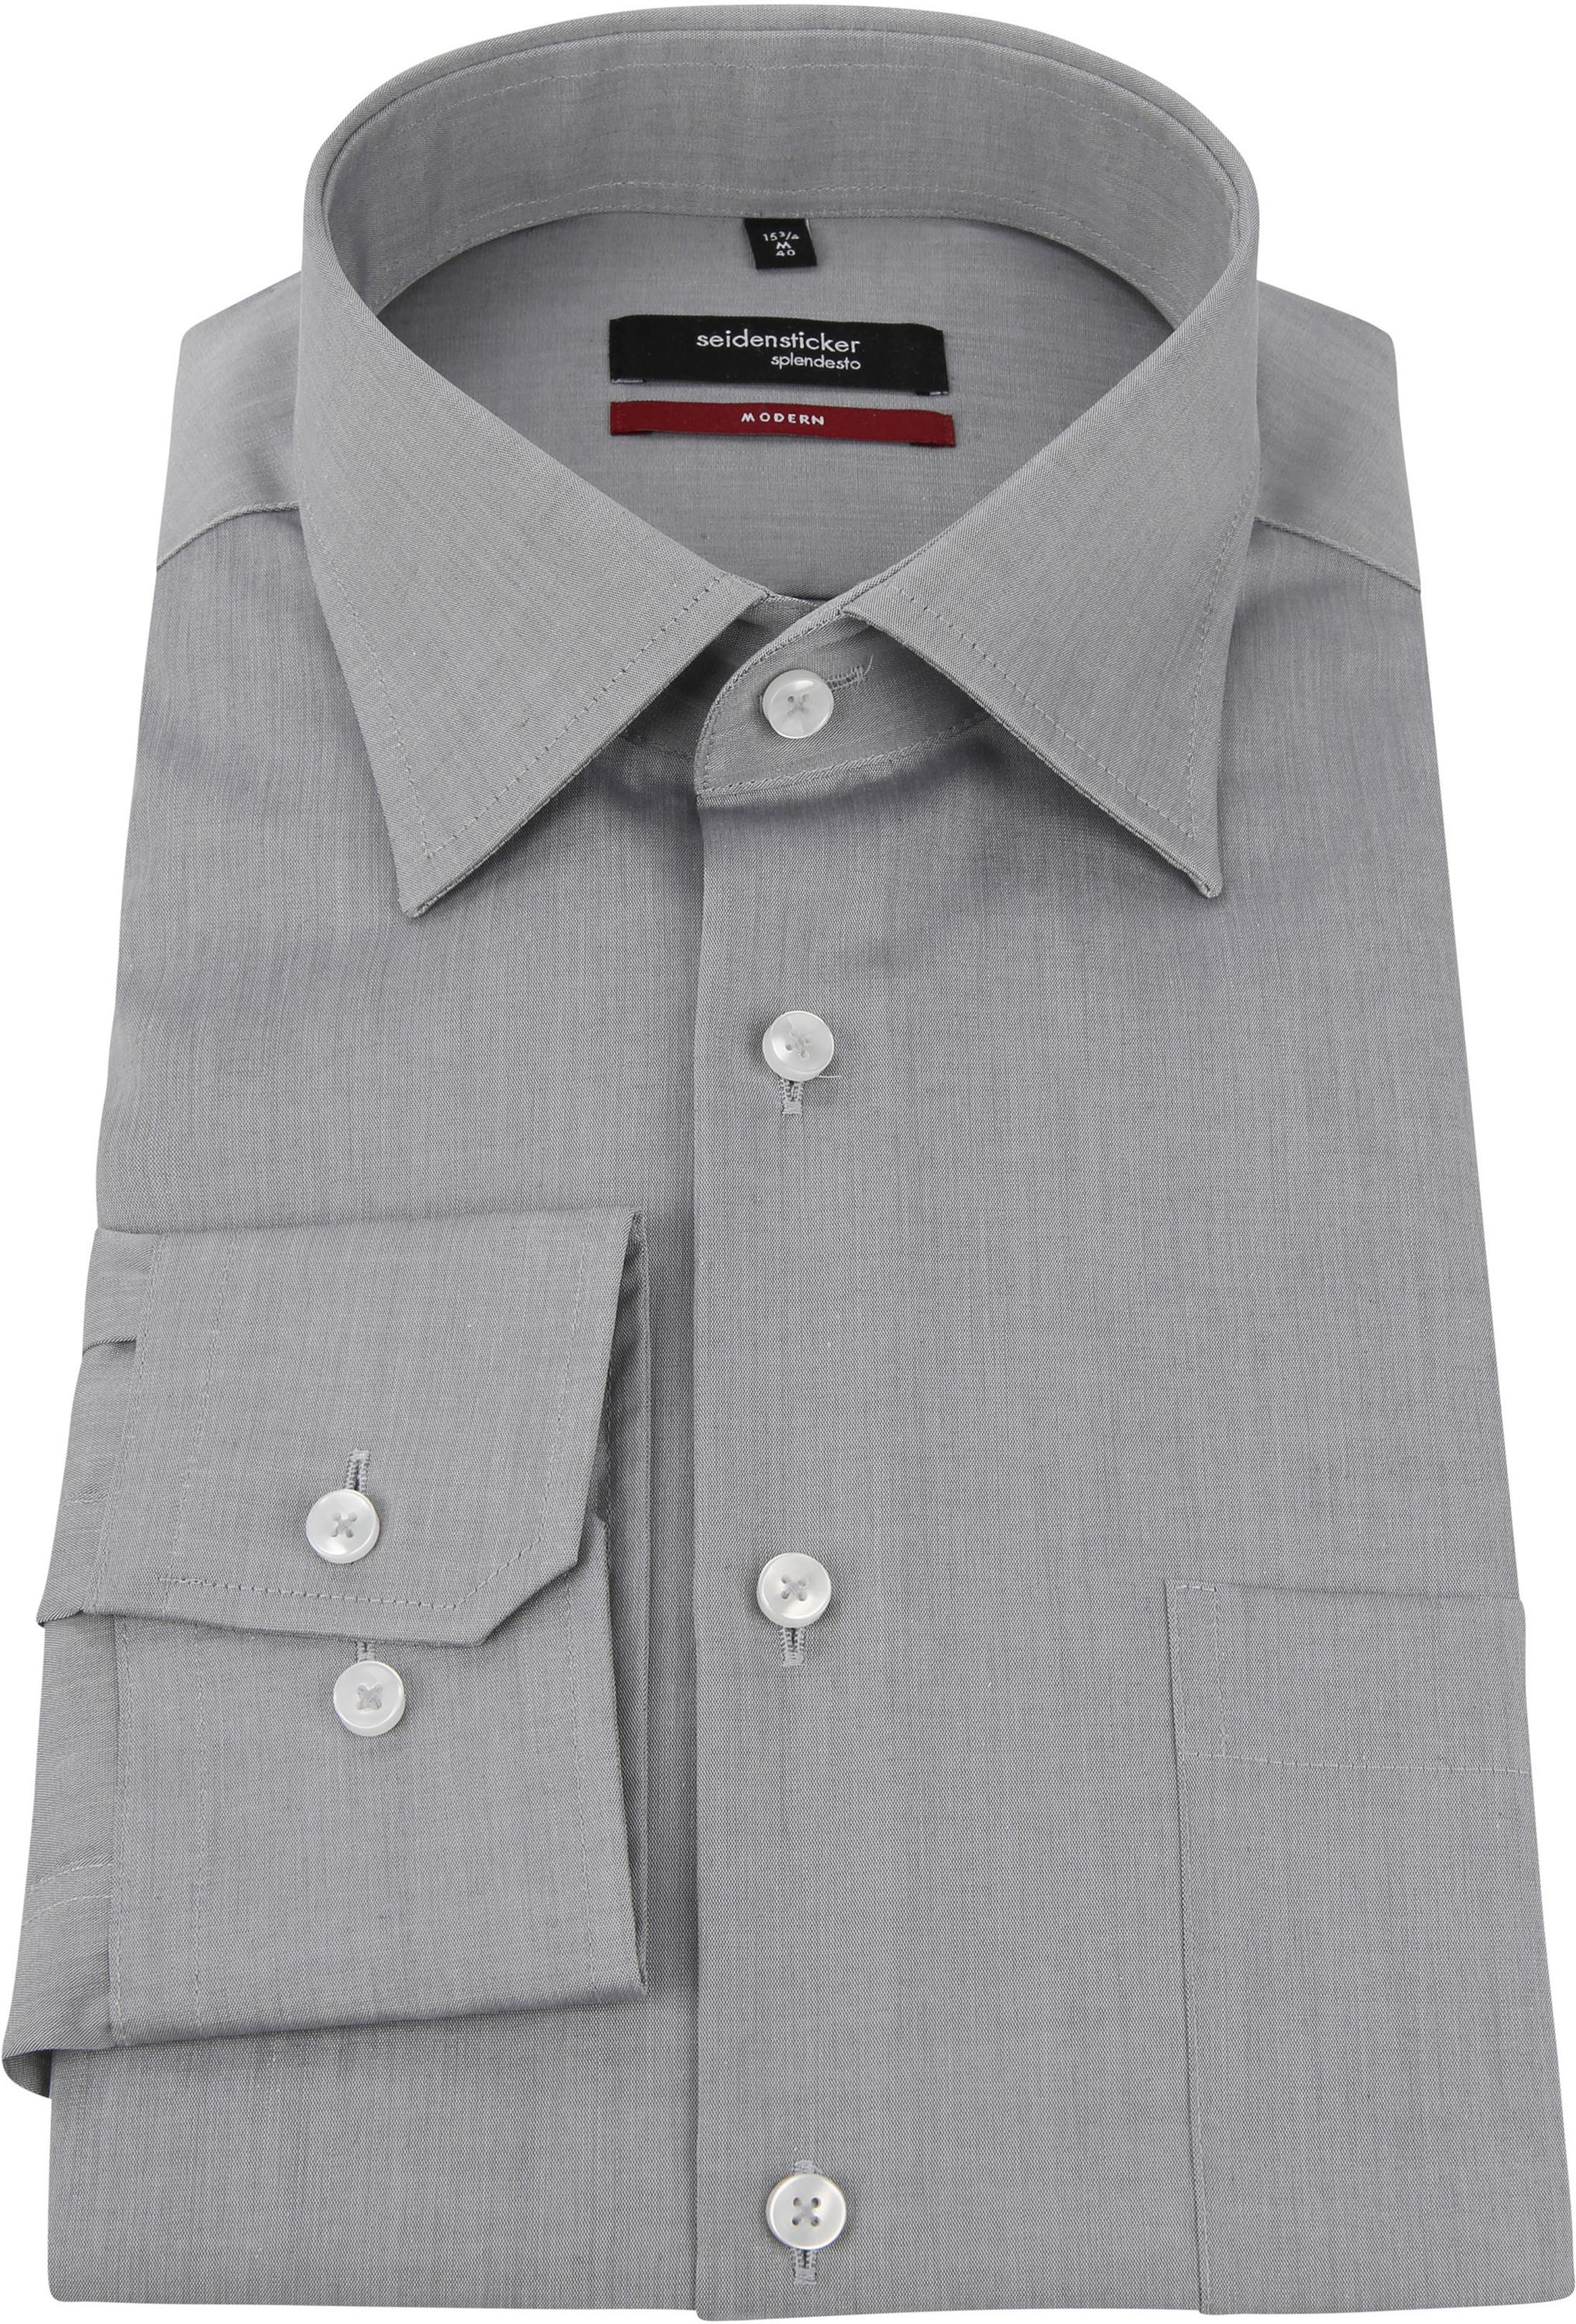 Seidensticker Hemd Bügelfrei Modern Grau foto 2